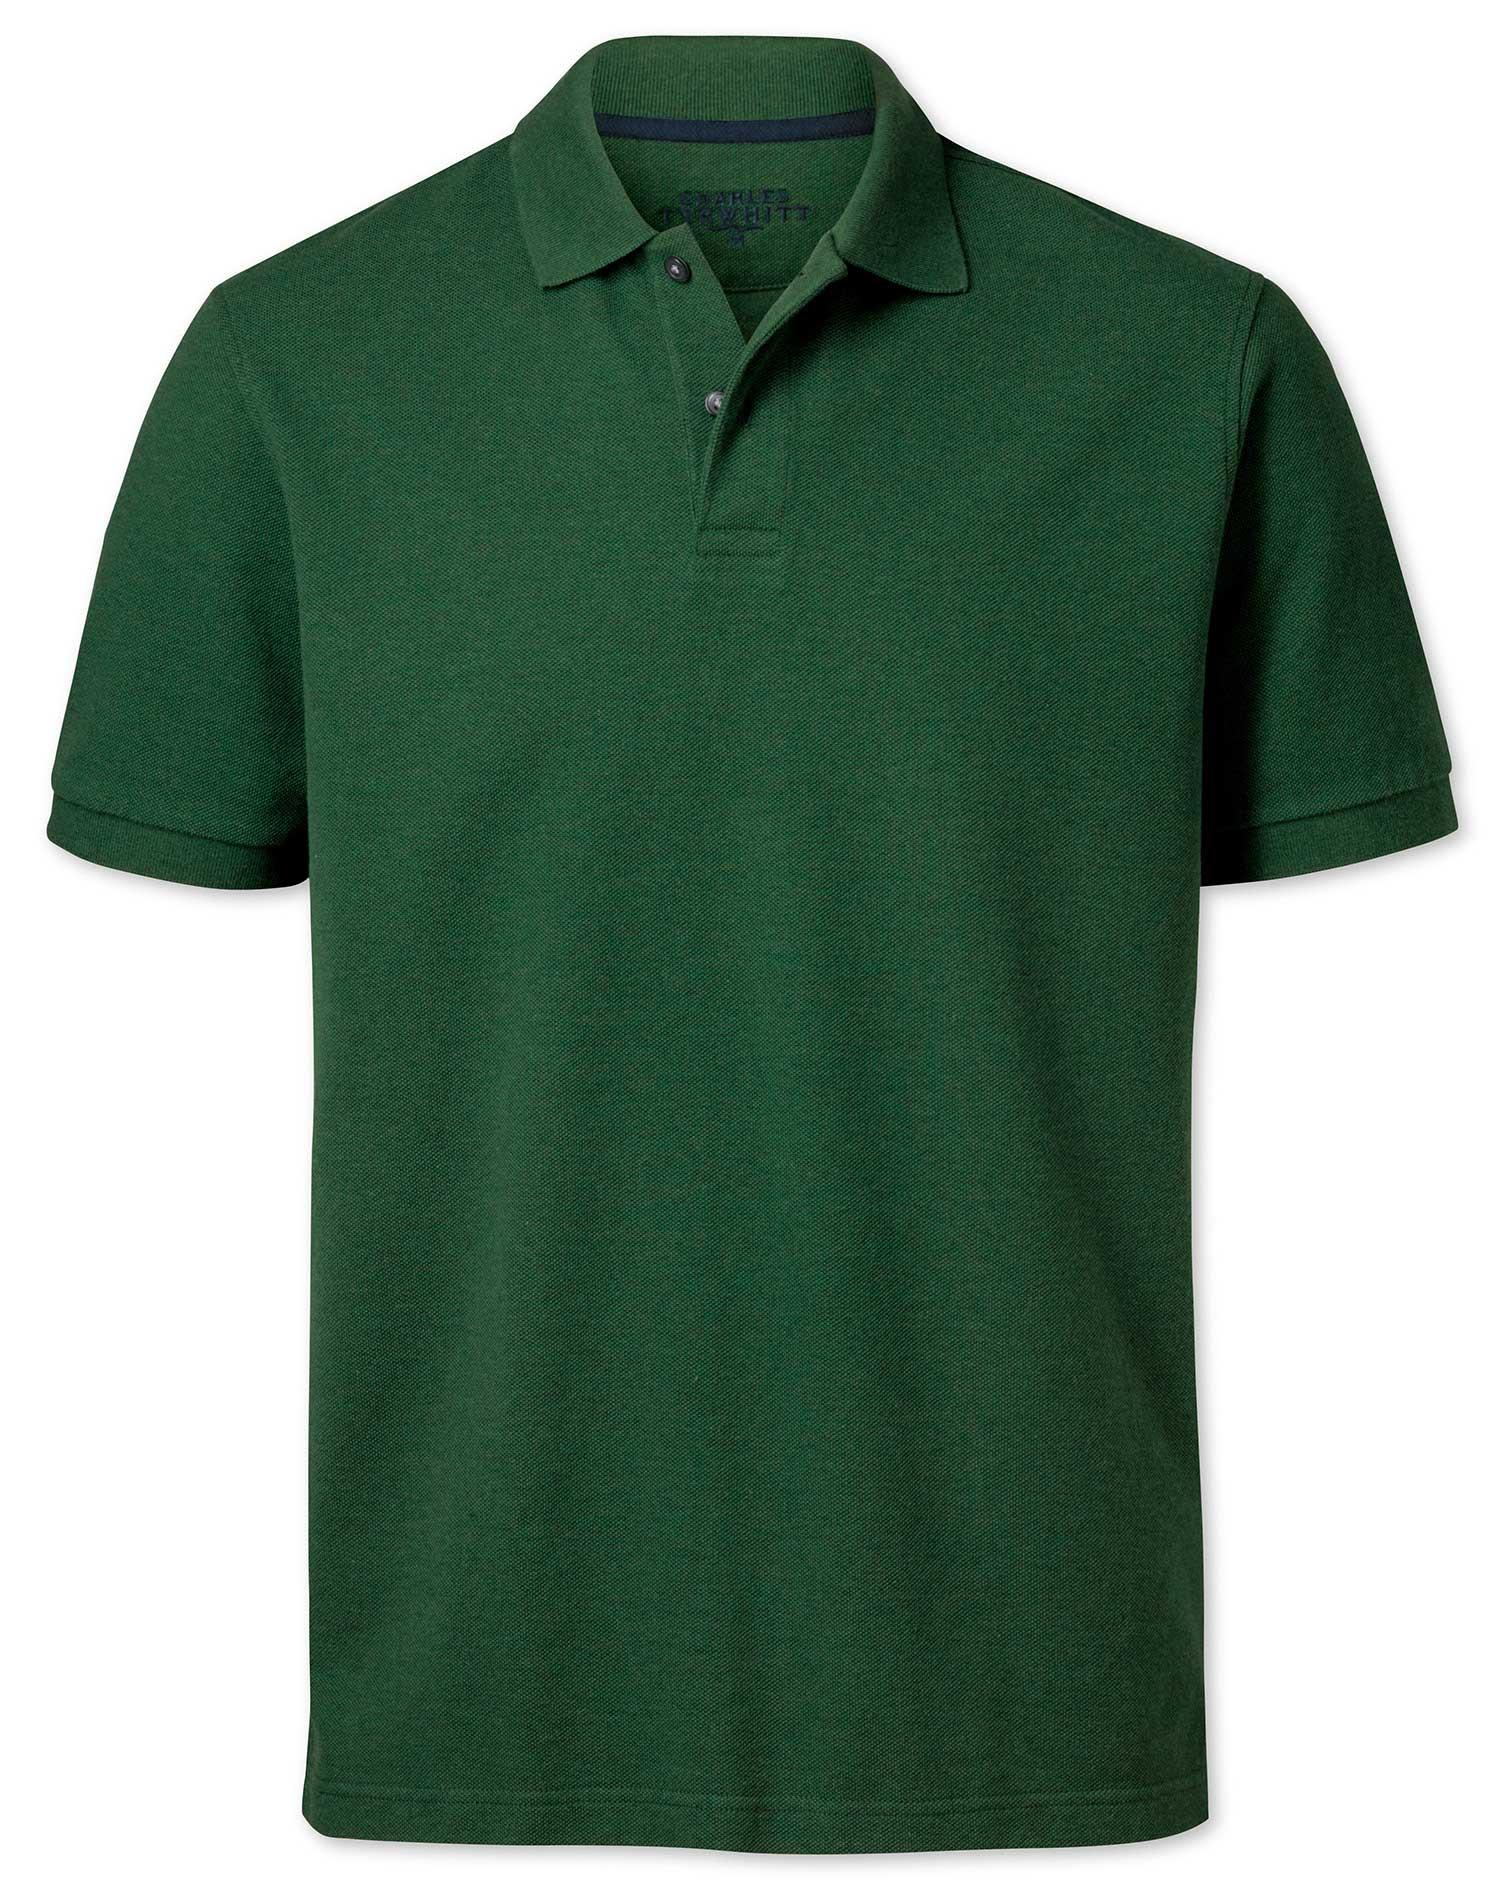 Green Cotton Pique Polo Size Medium by Charles Tyrwhitt